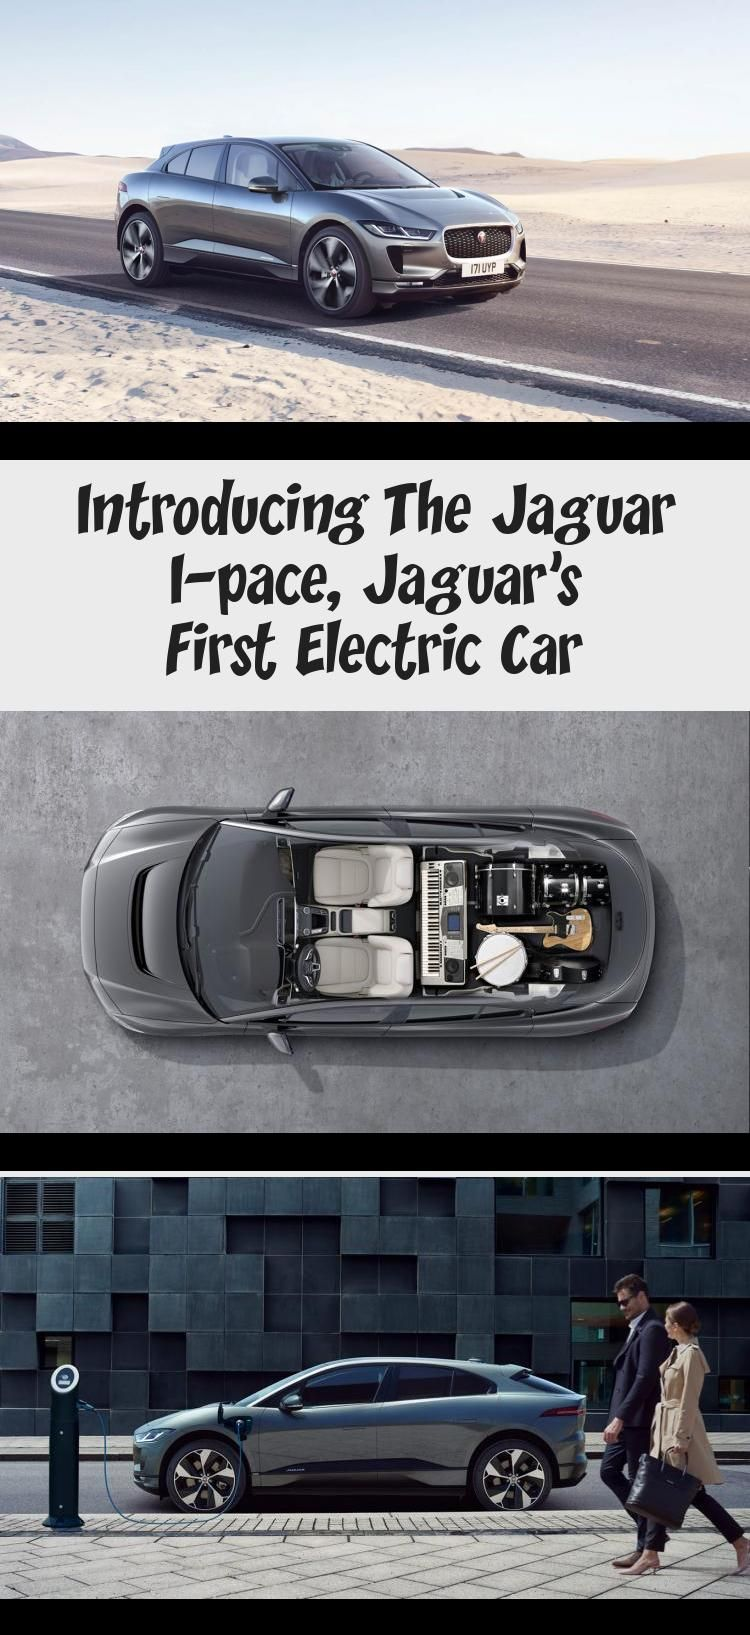 Introducing The Jaguar I Pace Jaguar S First Electric Car Technology In 2020 Jaguar Car Electric Car